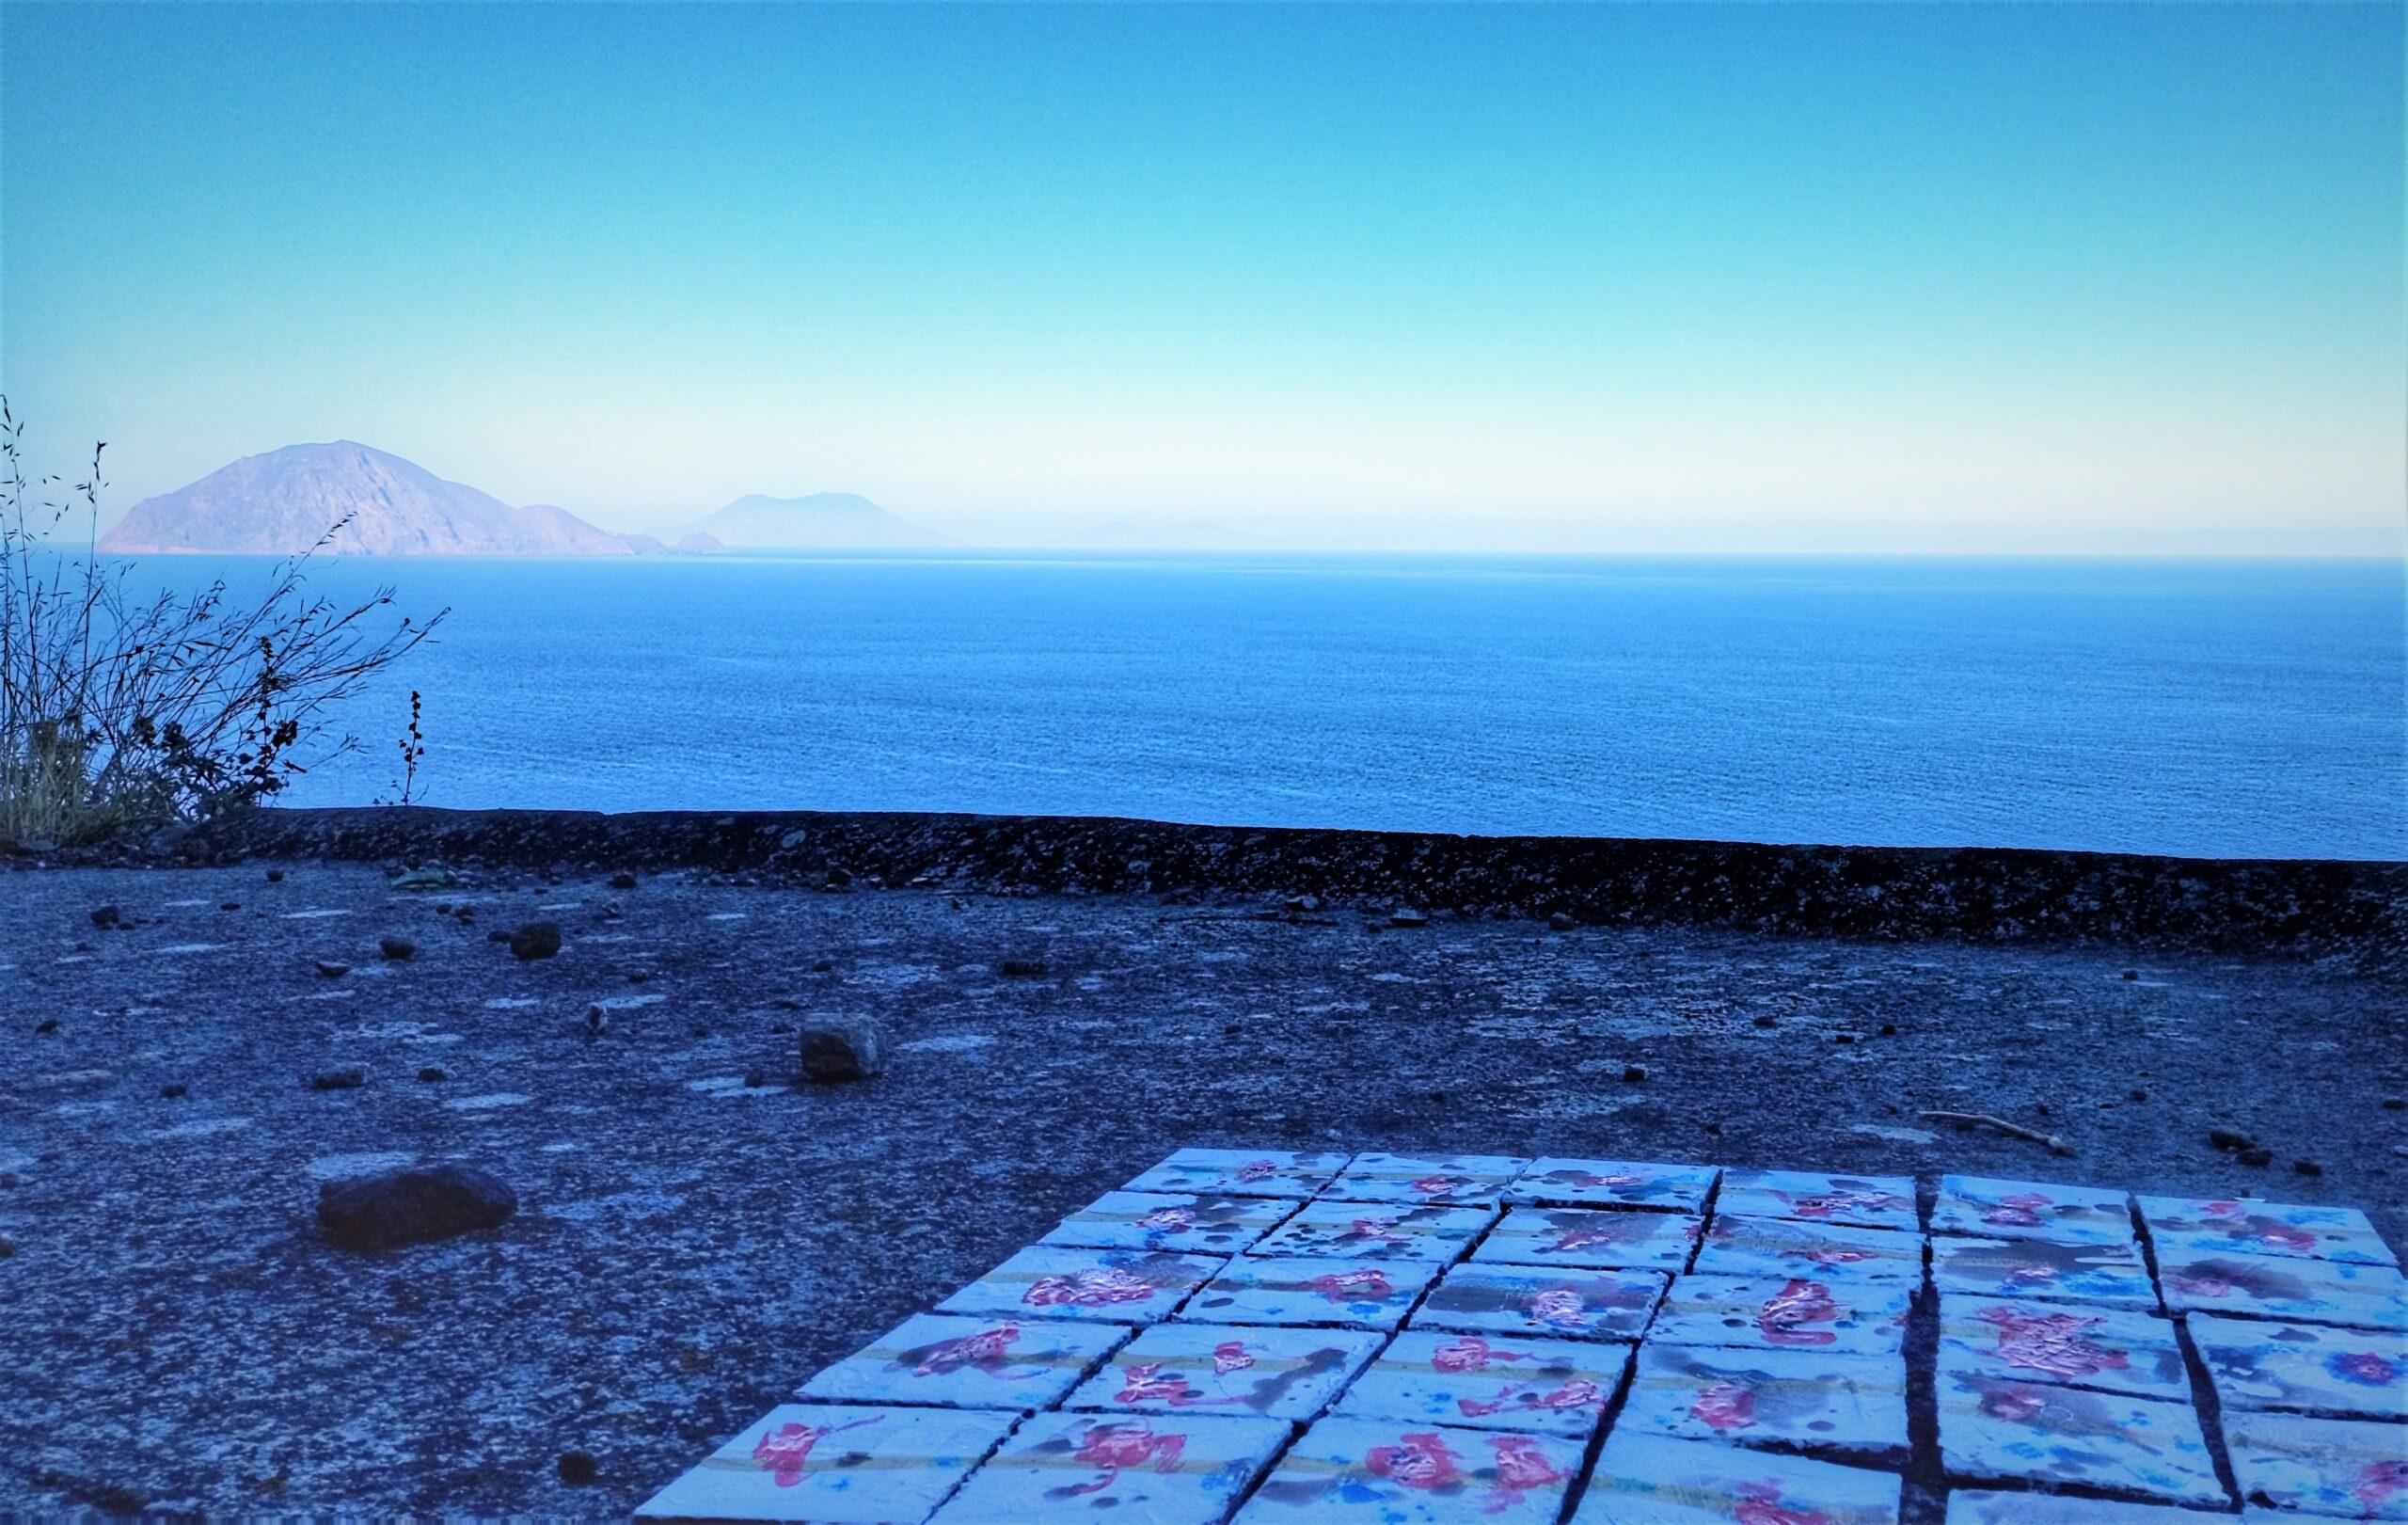 alicudi contemporay artist sicily mediterranean island